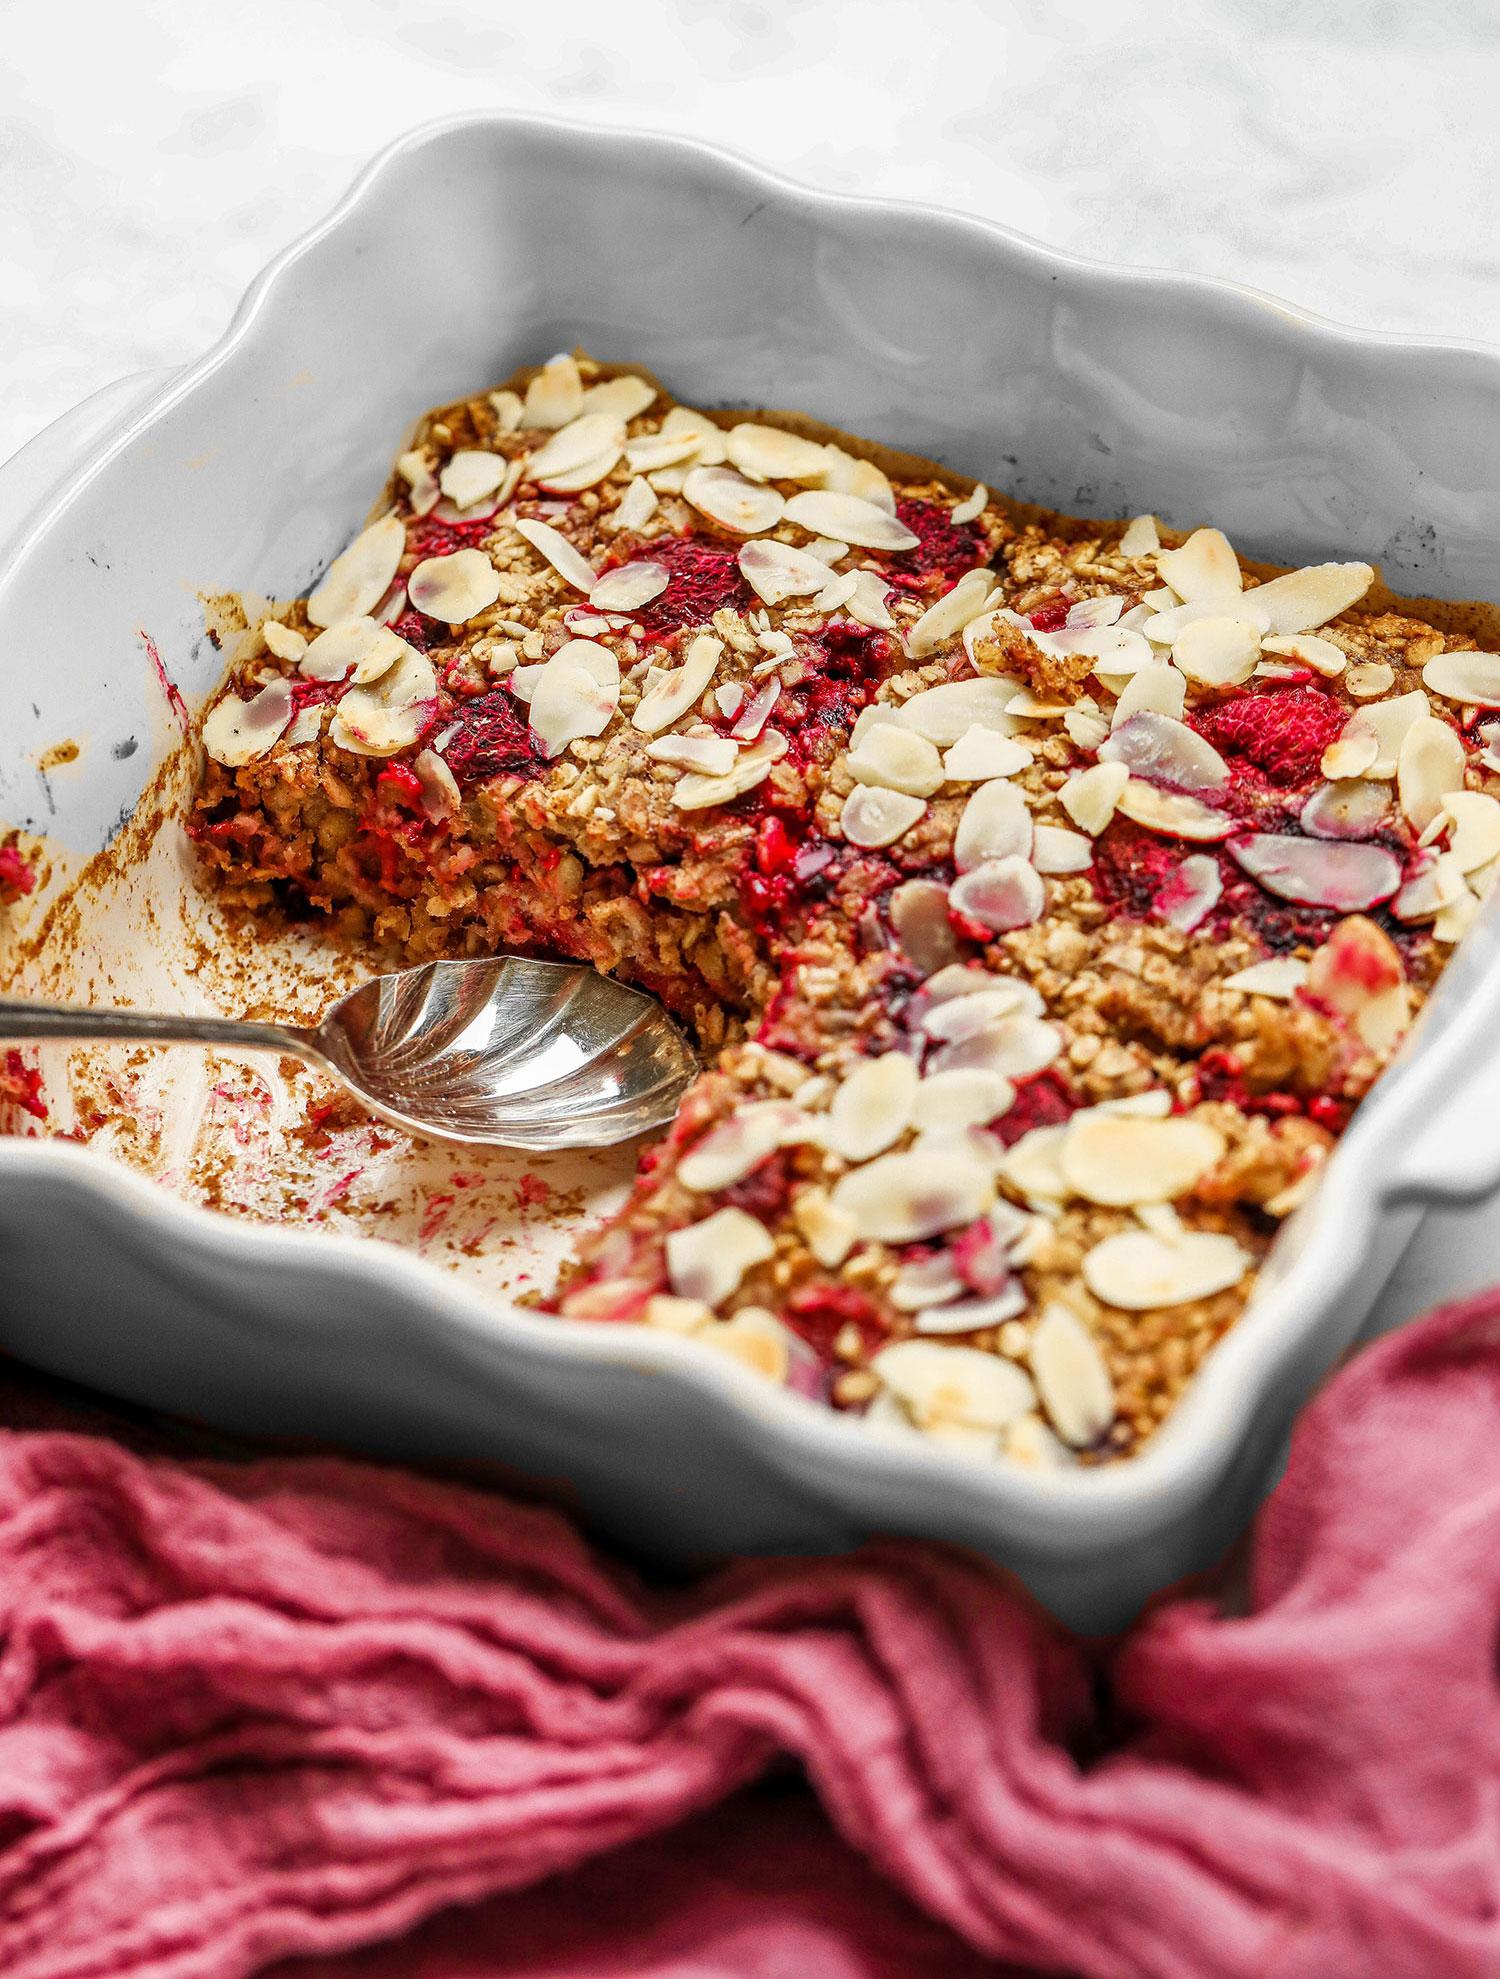 Raspberry Almond Baked Oats